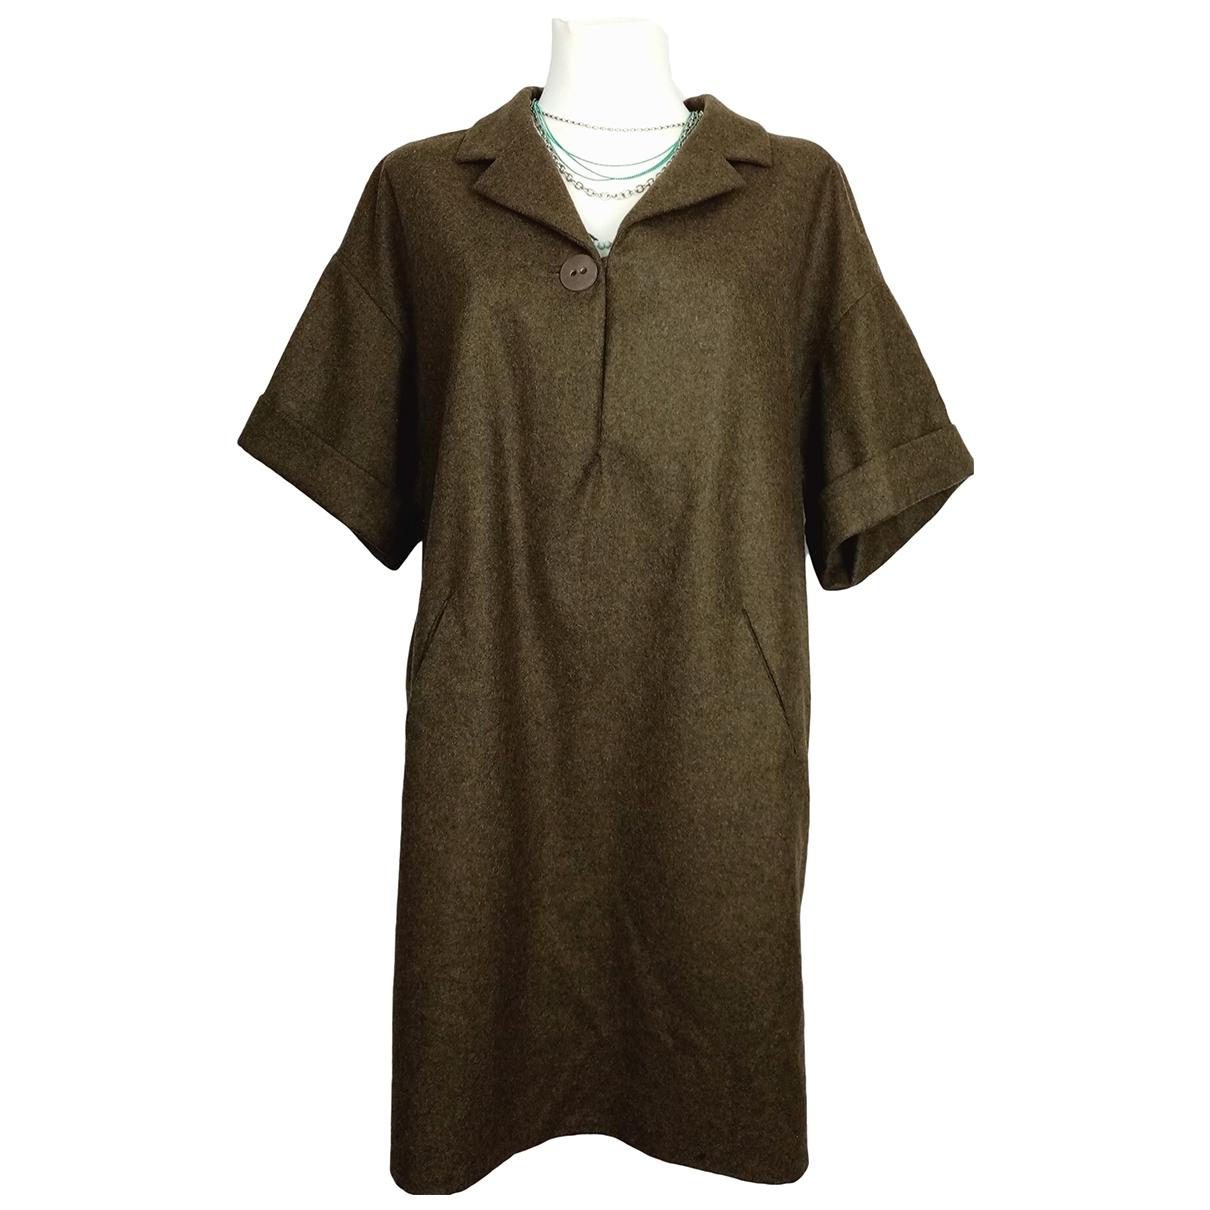 Isabel Marant Etoile \N Brown Wool dress for Women 3 0-5